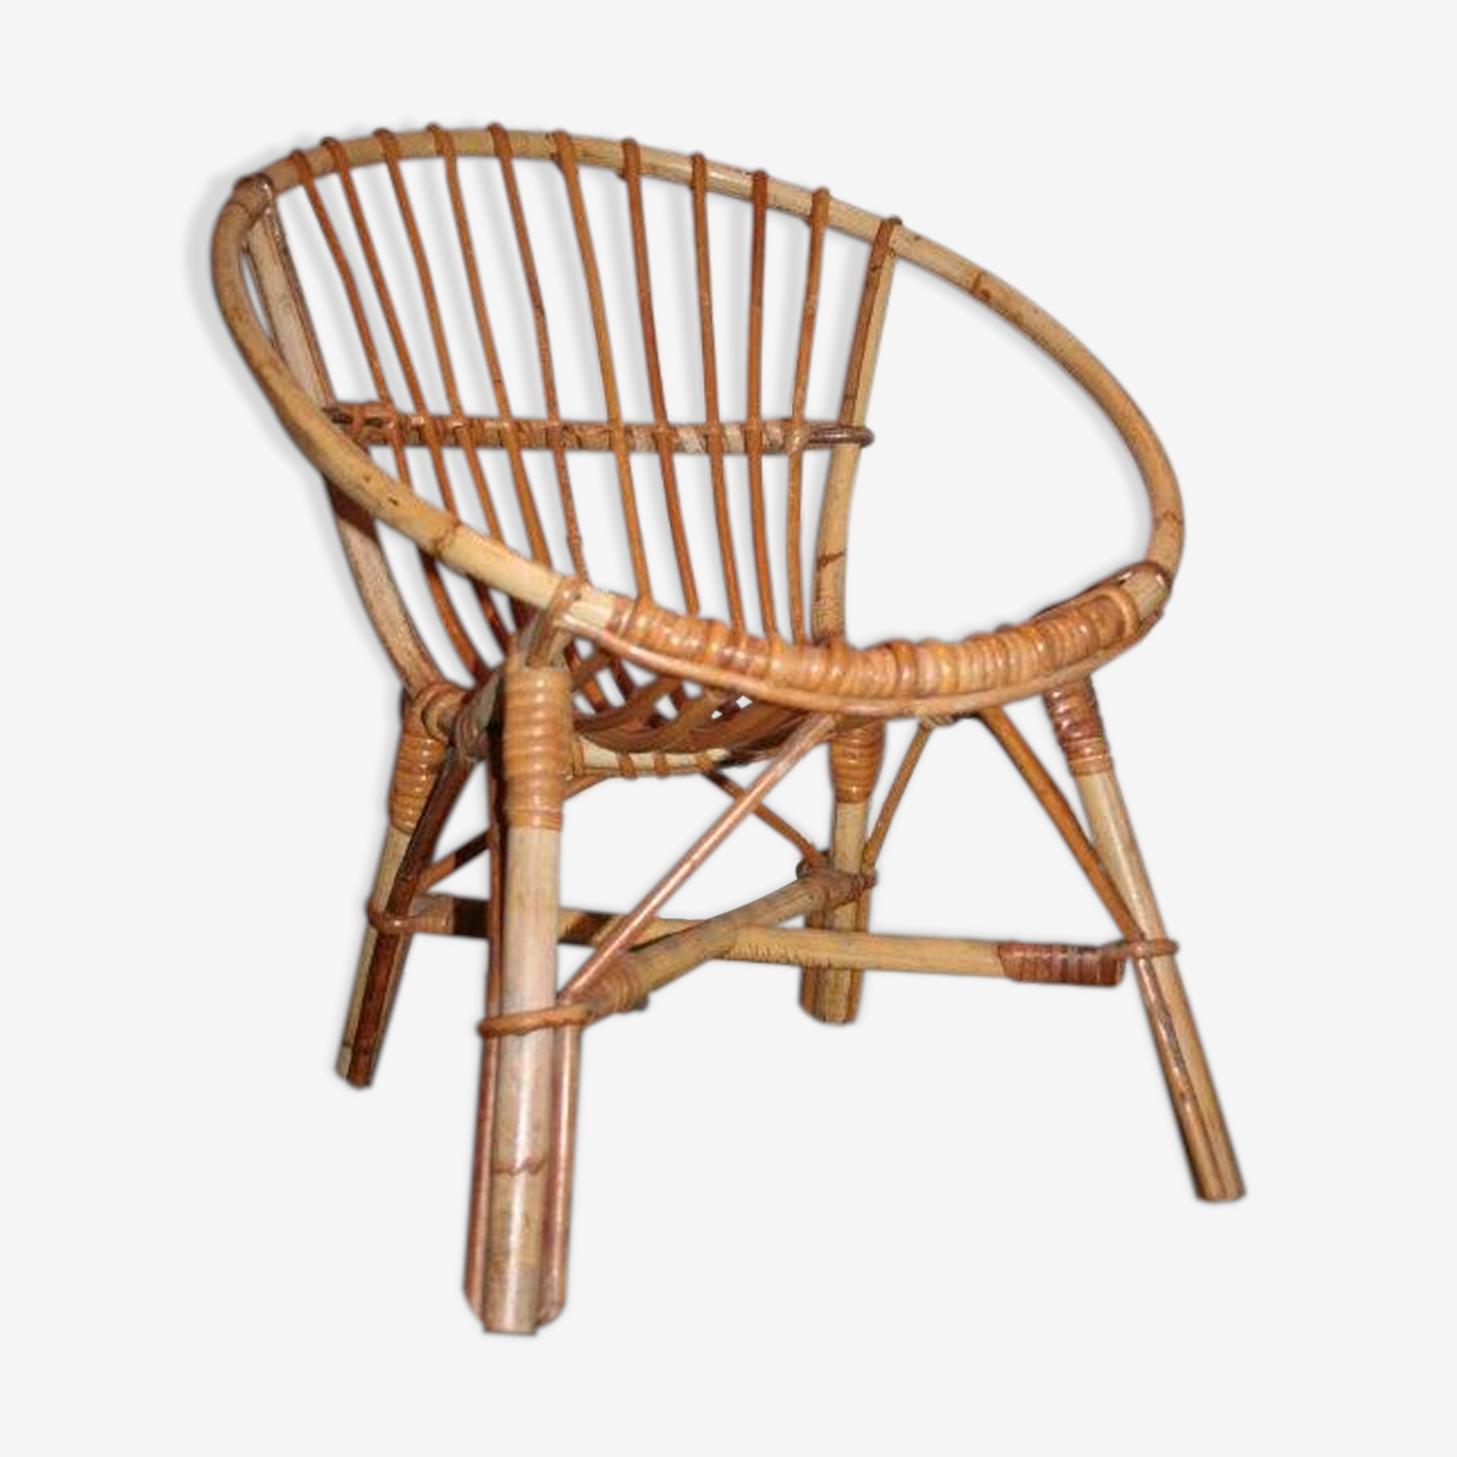 Vintage wicker shell armchair